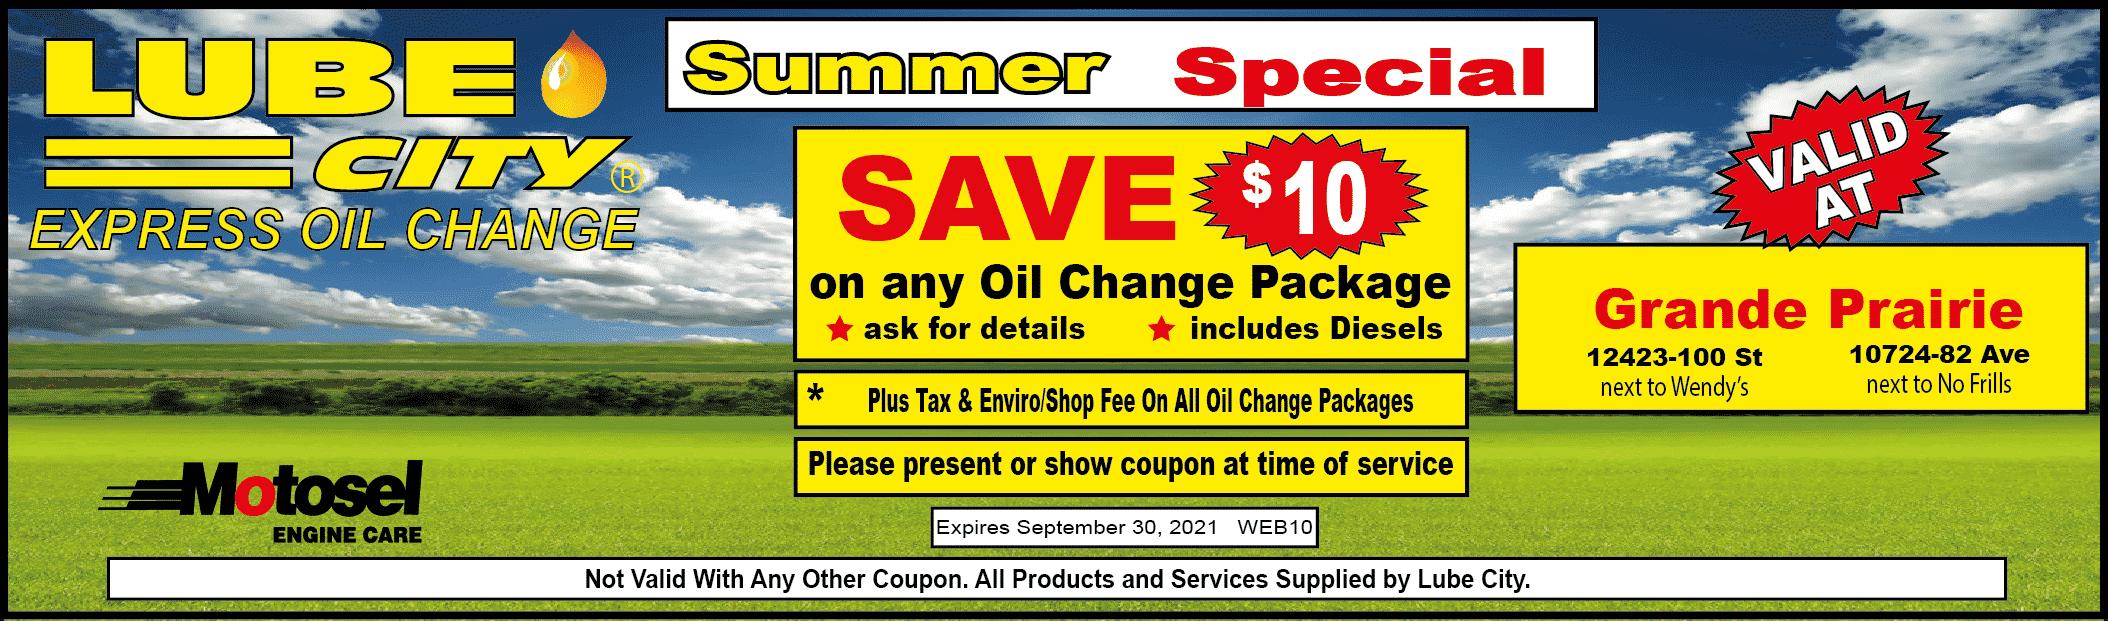 lube city grande prairie oil change coupon